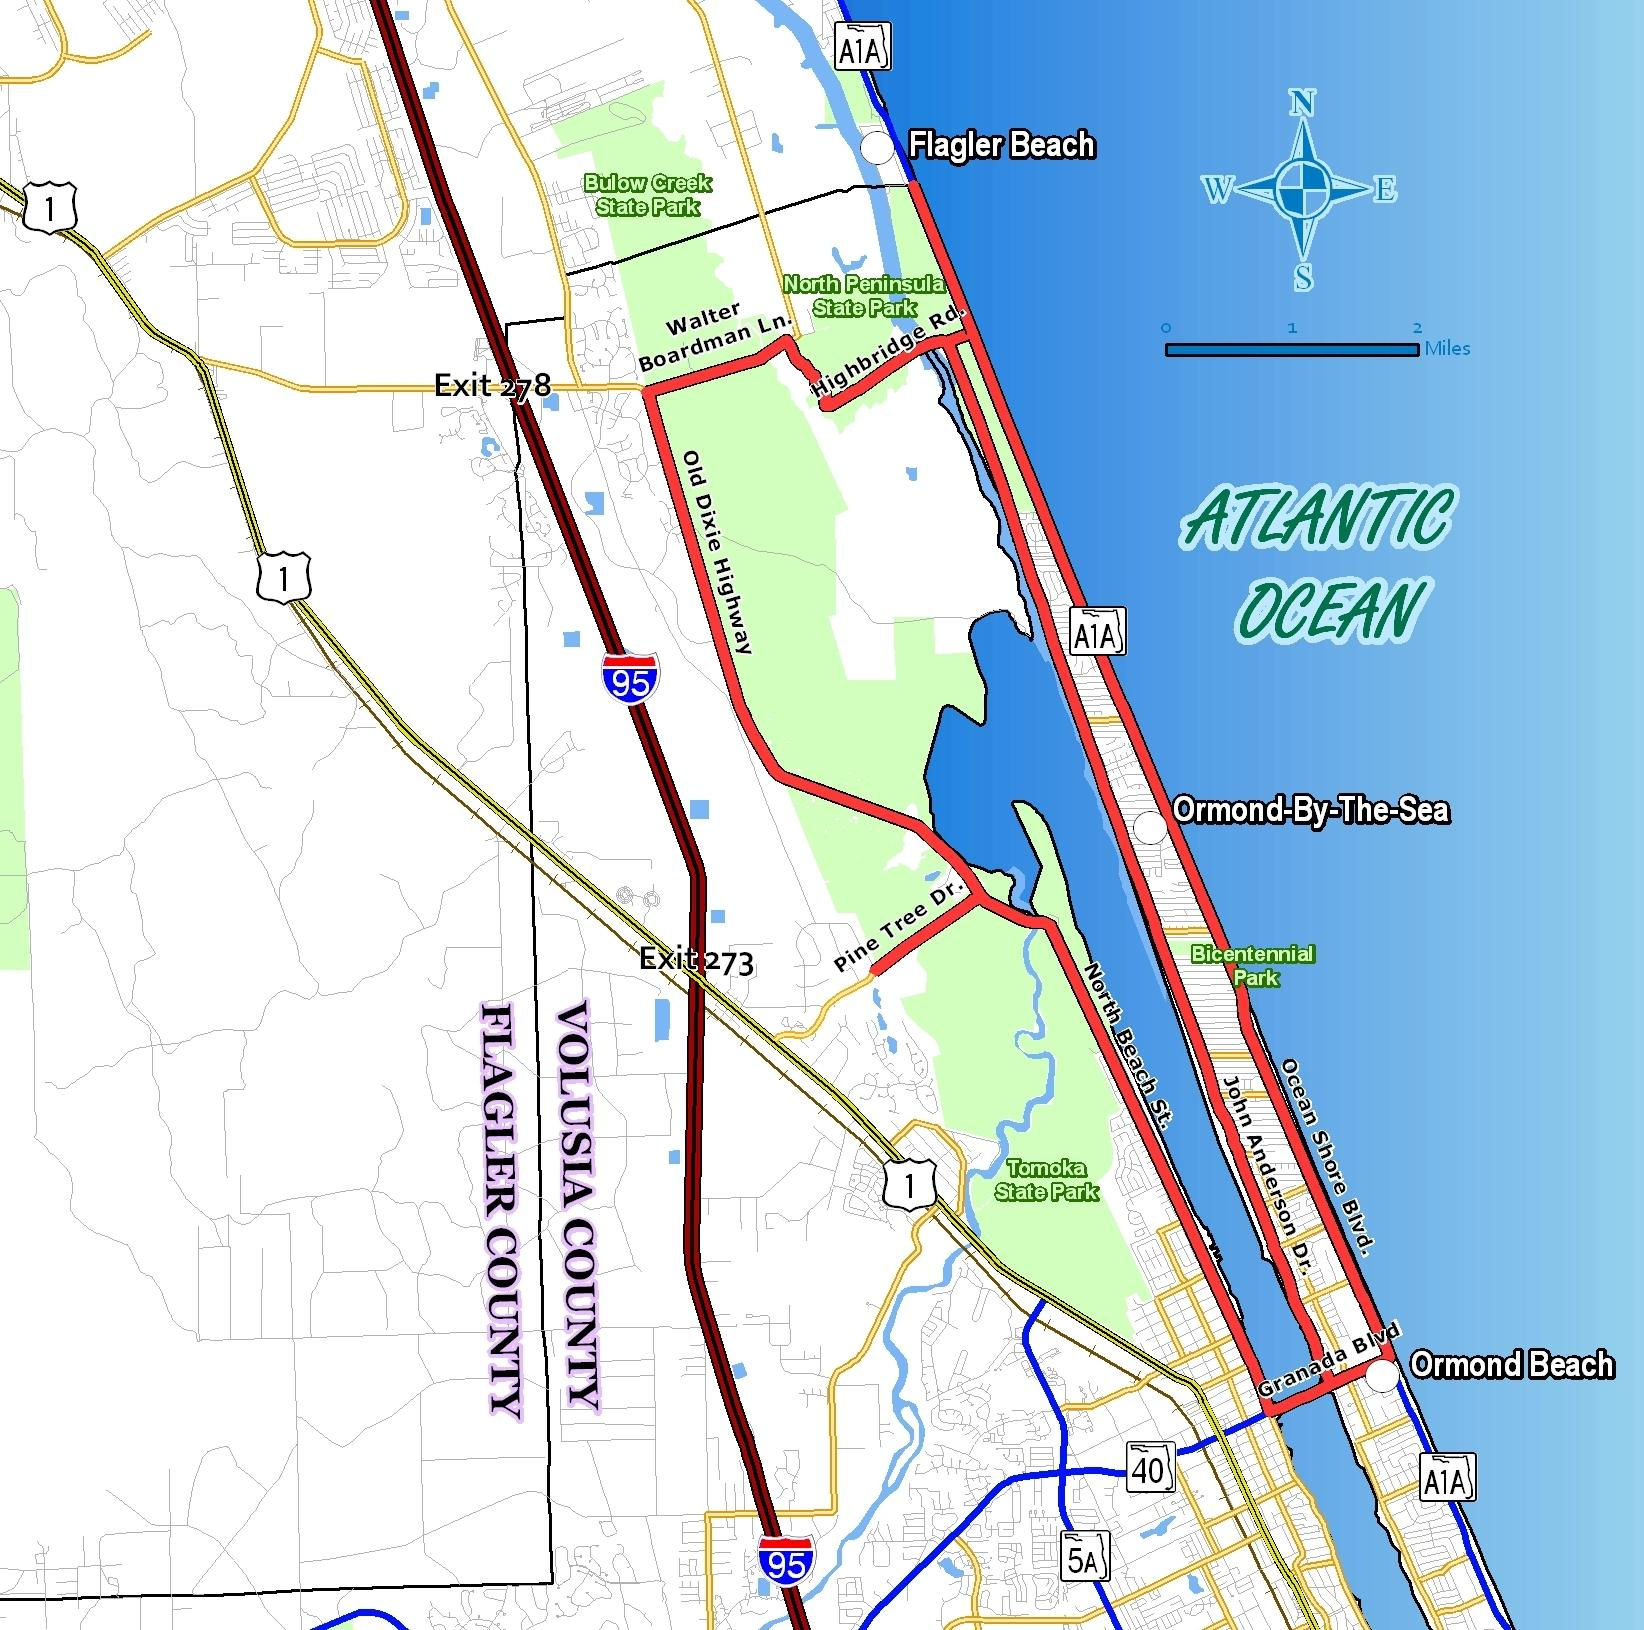 Oslt Index - Smyrna Beach Florida Map